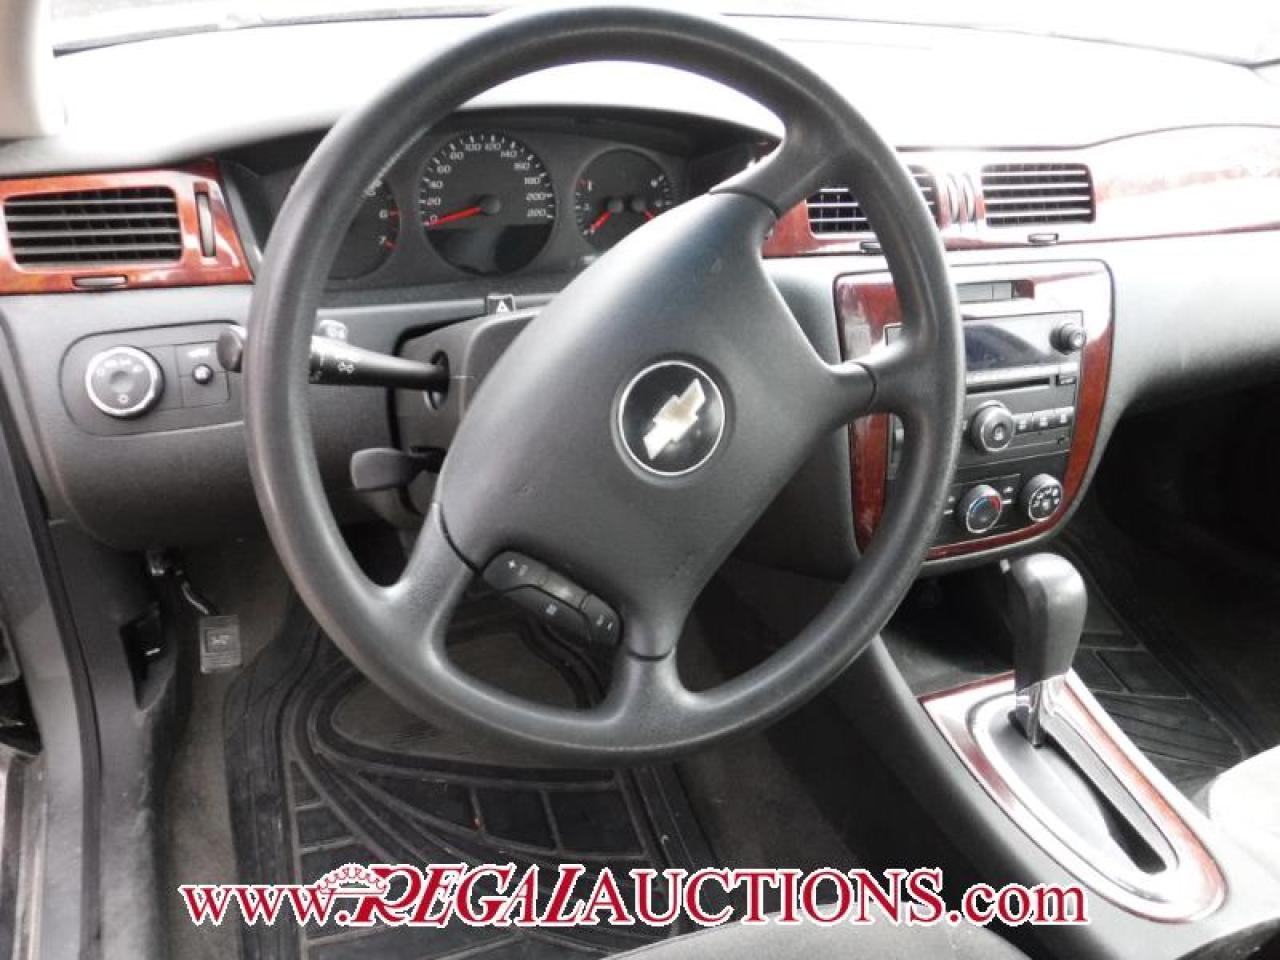 2007 Chevrolet IMPALA LS 4D SEDAN